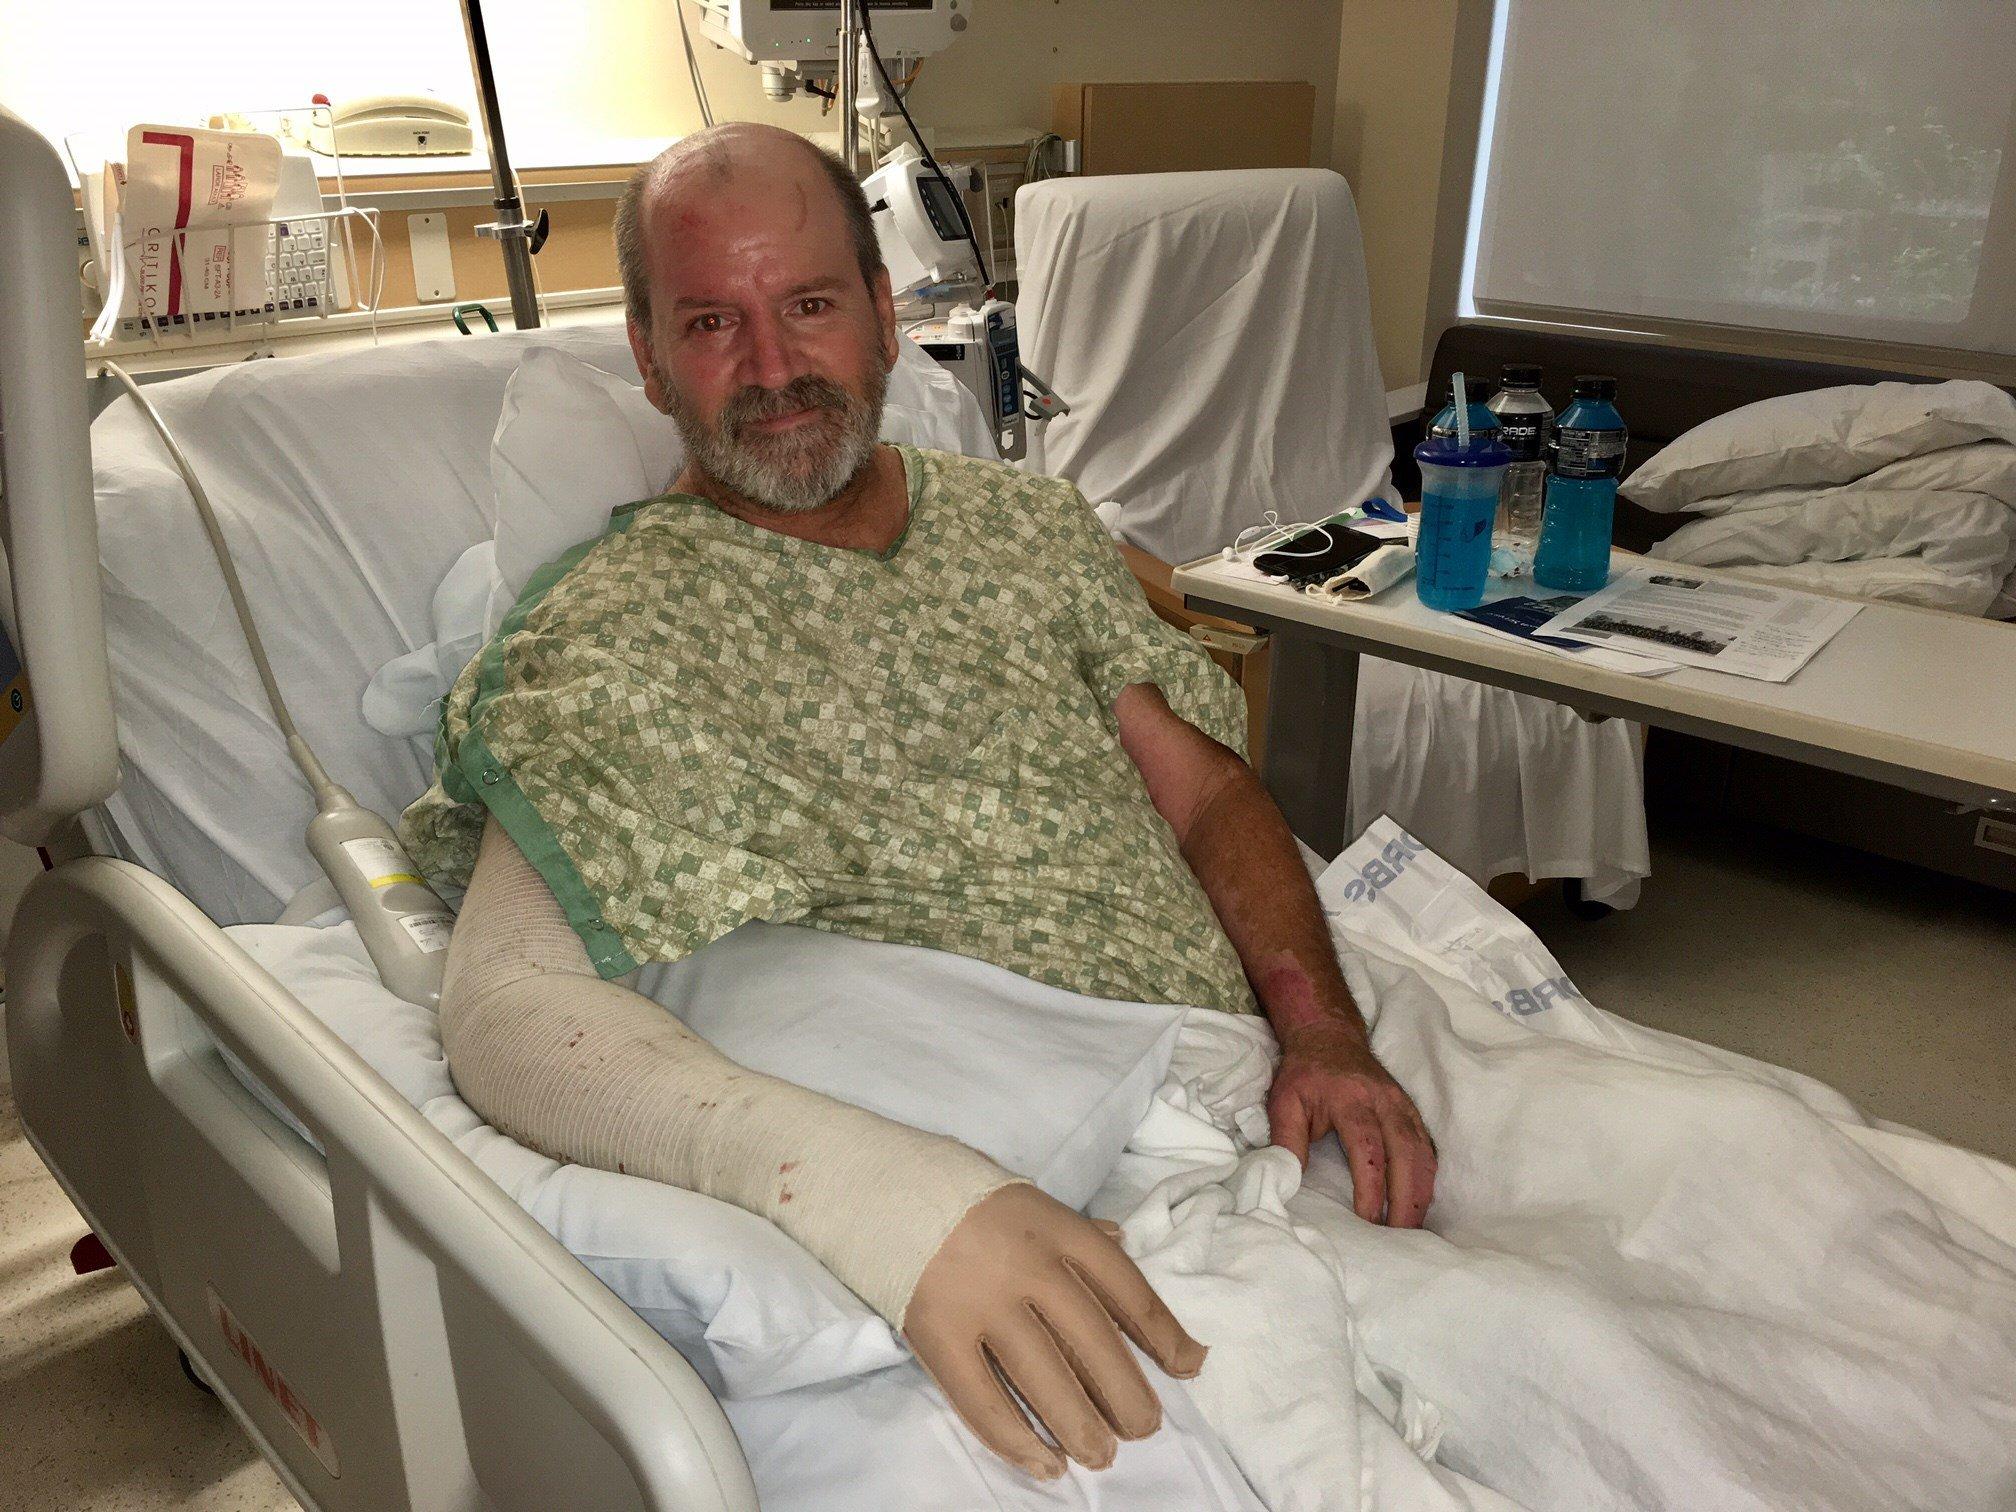 TJ Shaw recovering at the Oregon Burn Center Monday. (KPTV)